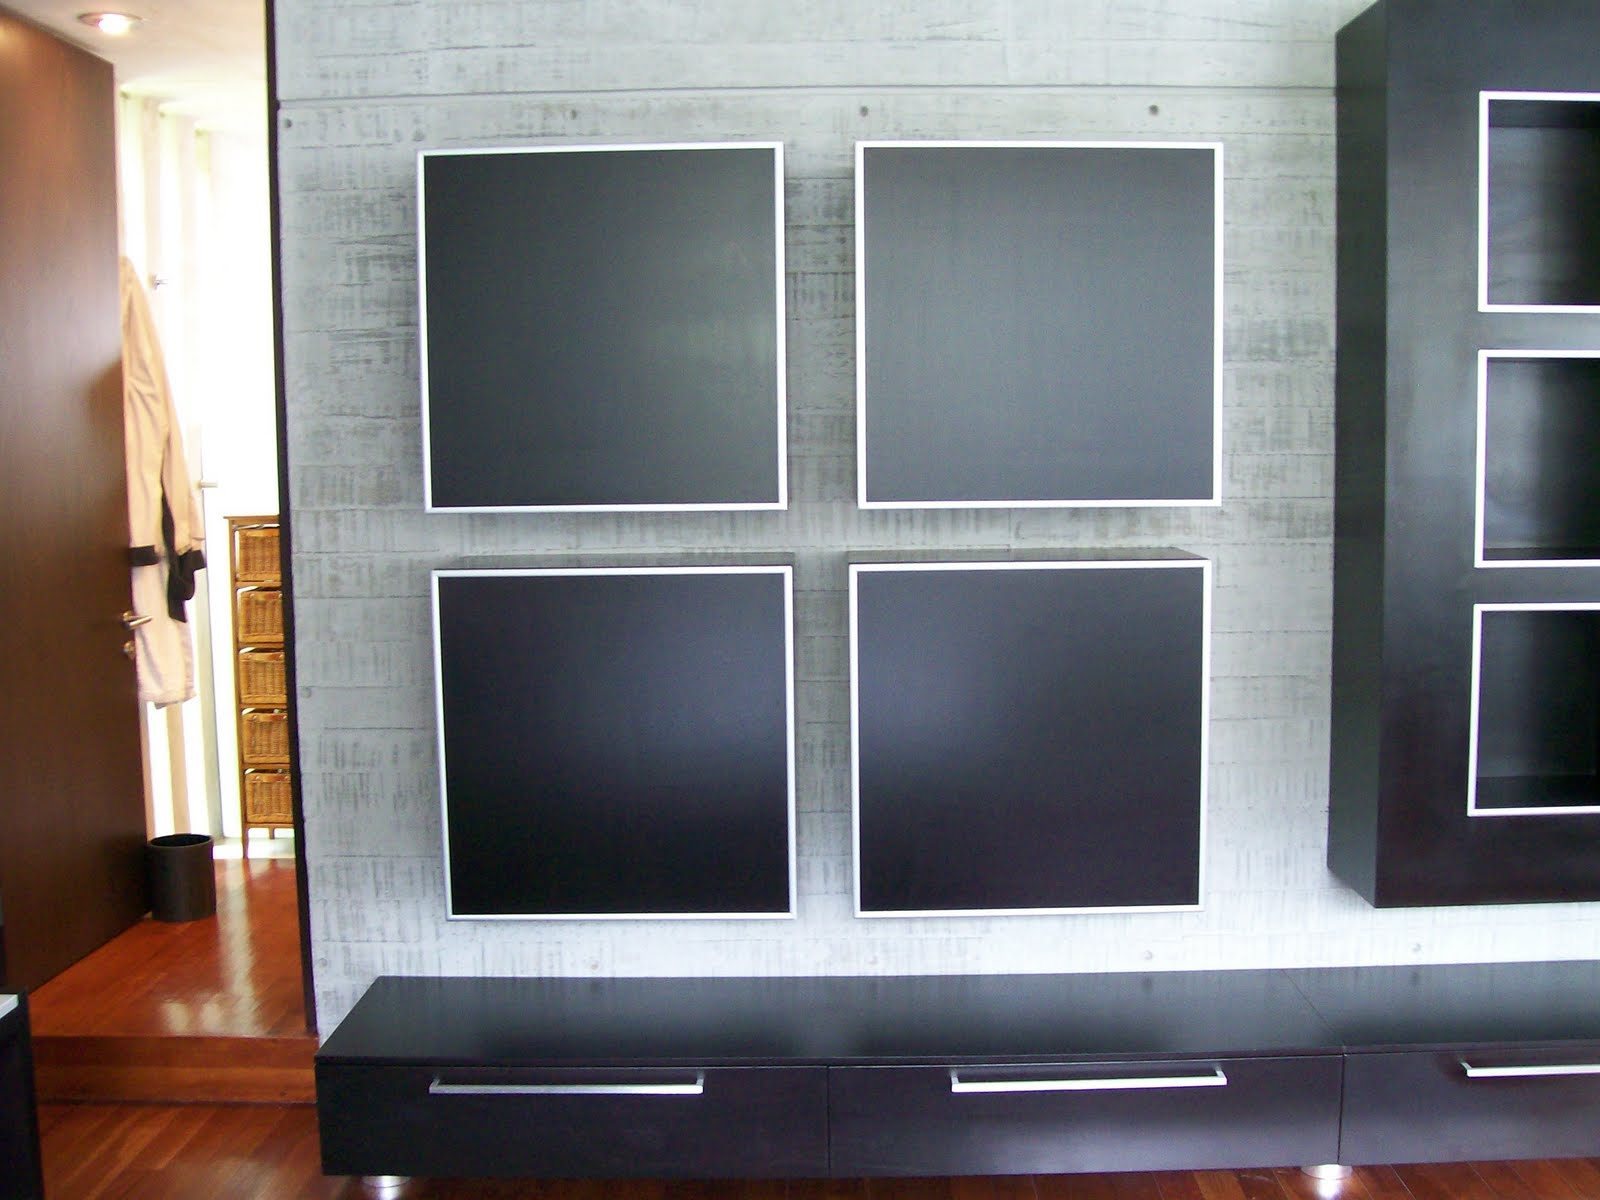 Muebles sobre Diseño AVL: Muebles para T.V.